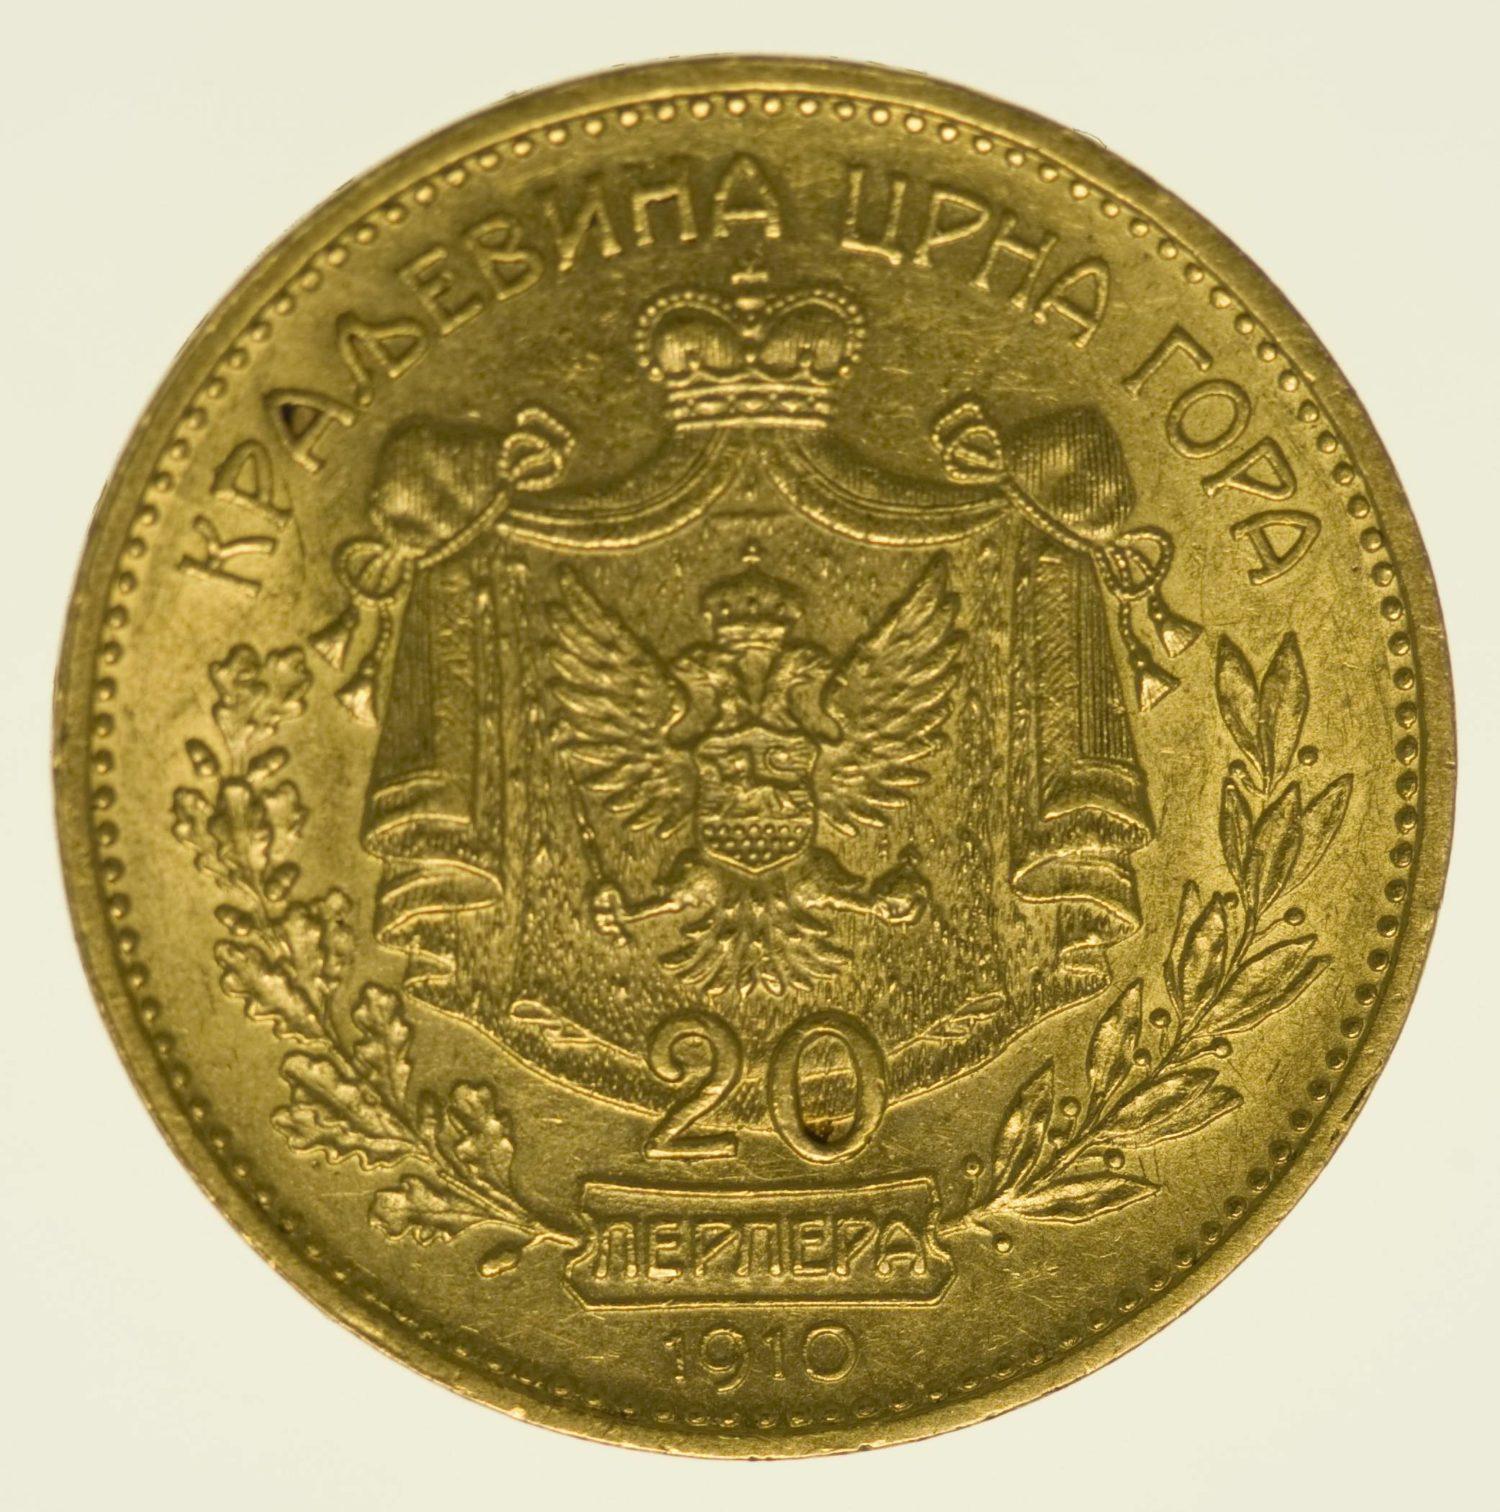 Montenegro Nikolaus I. 20 Perpera 1910 Gold 6,10 Gramm fein RAR